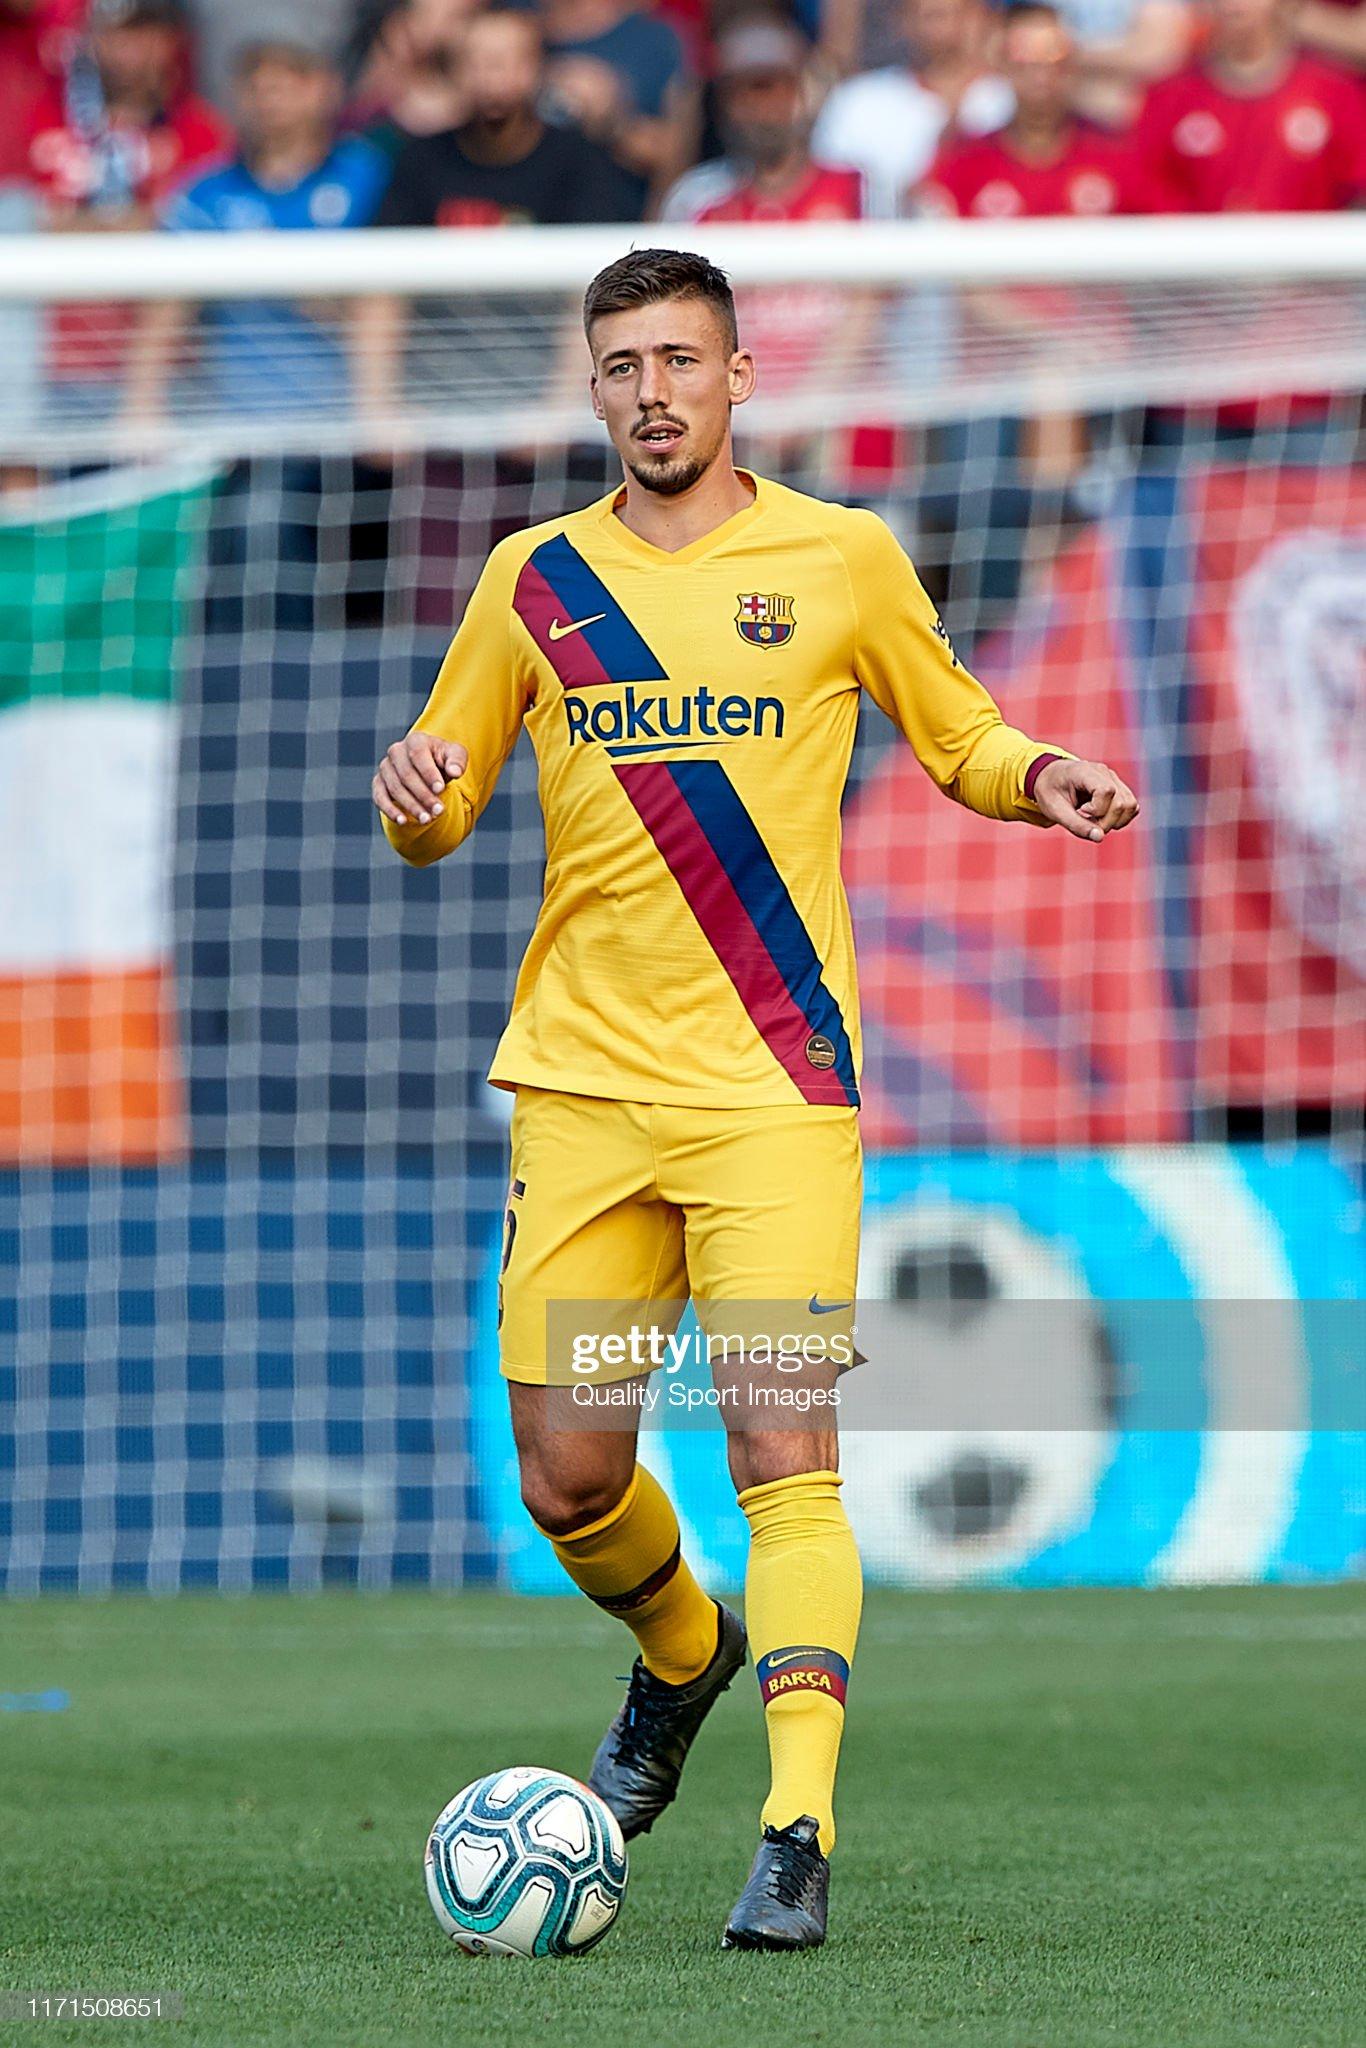 صور مباراة : أوساسونا - برشلونة 2-2 ( 31-08-2019 )  Clement-lenglet-of-fc-barcelona-with-the-ball-during-the-liga-match-picture-id1171508651?s=2048x2048